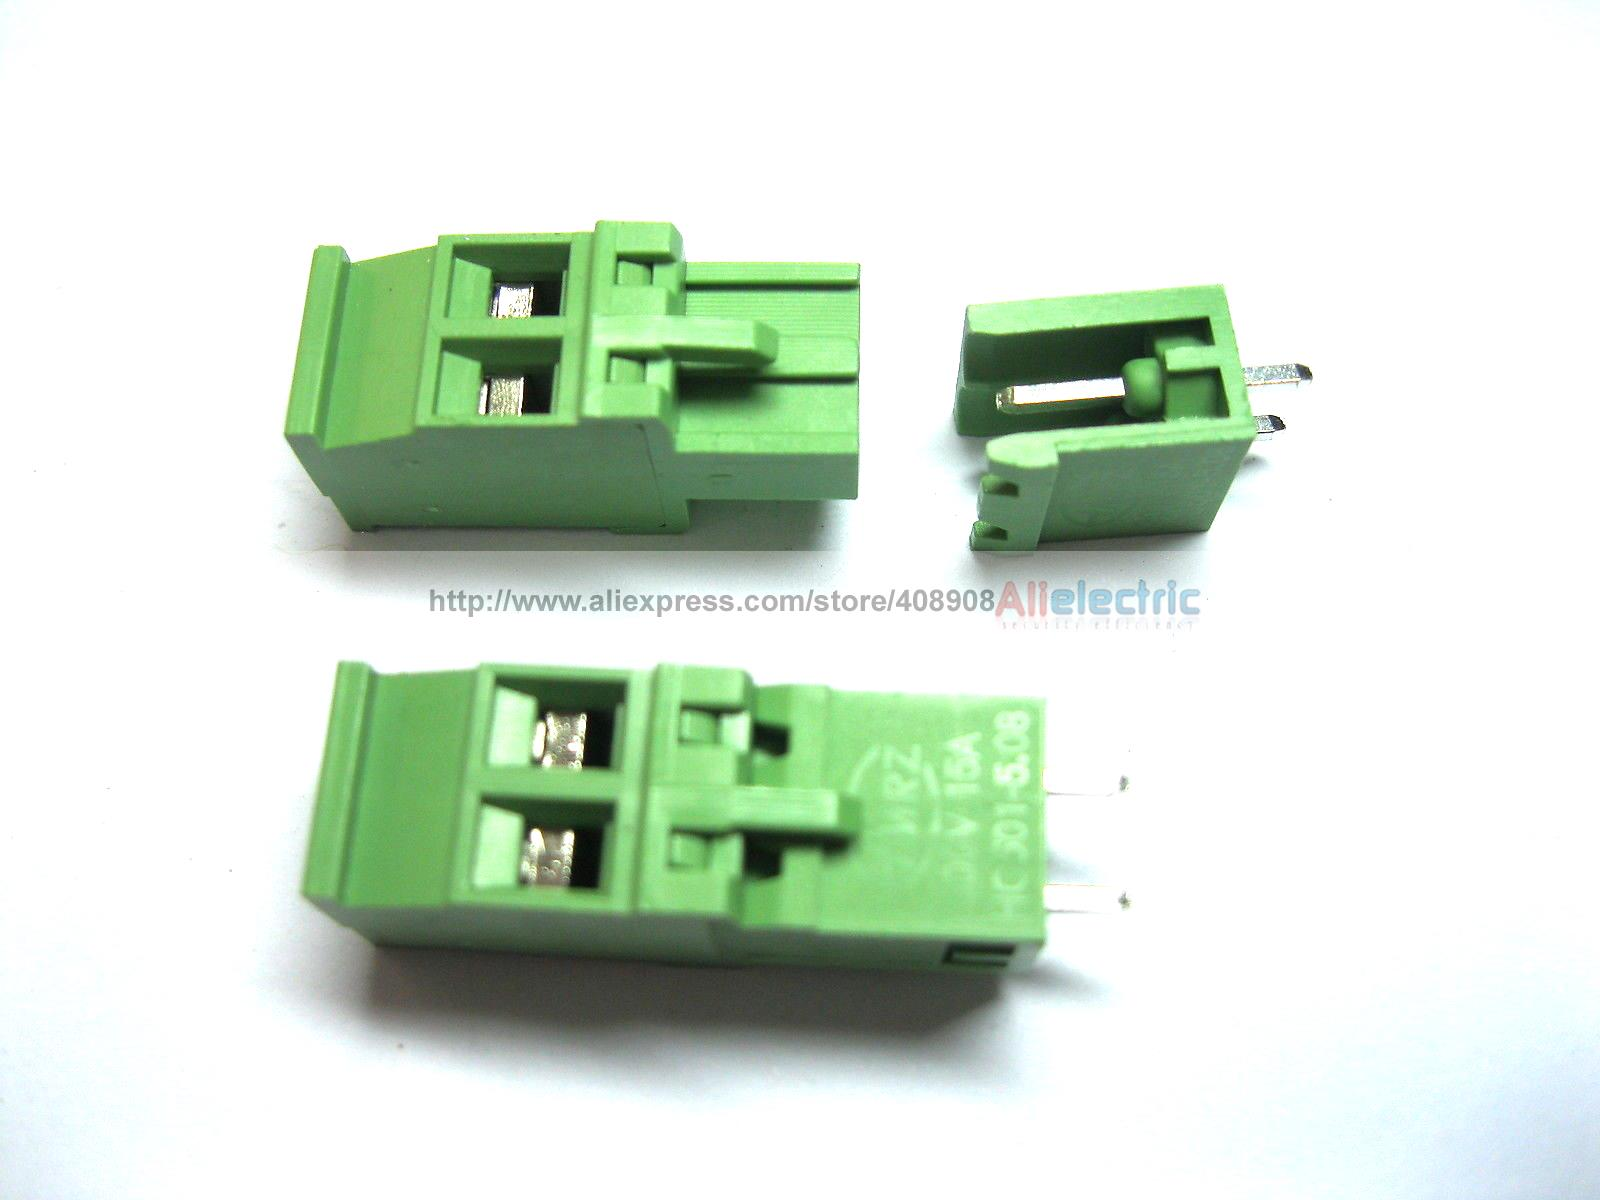 100 Pcs 5.08A 5.08mm Straight 2 Pin Screw Terminal Block Connector Pluggable Type 250 pcs green 2 pin 6 35mm screw terminal block connector wire cage type dc635